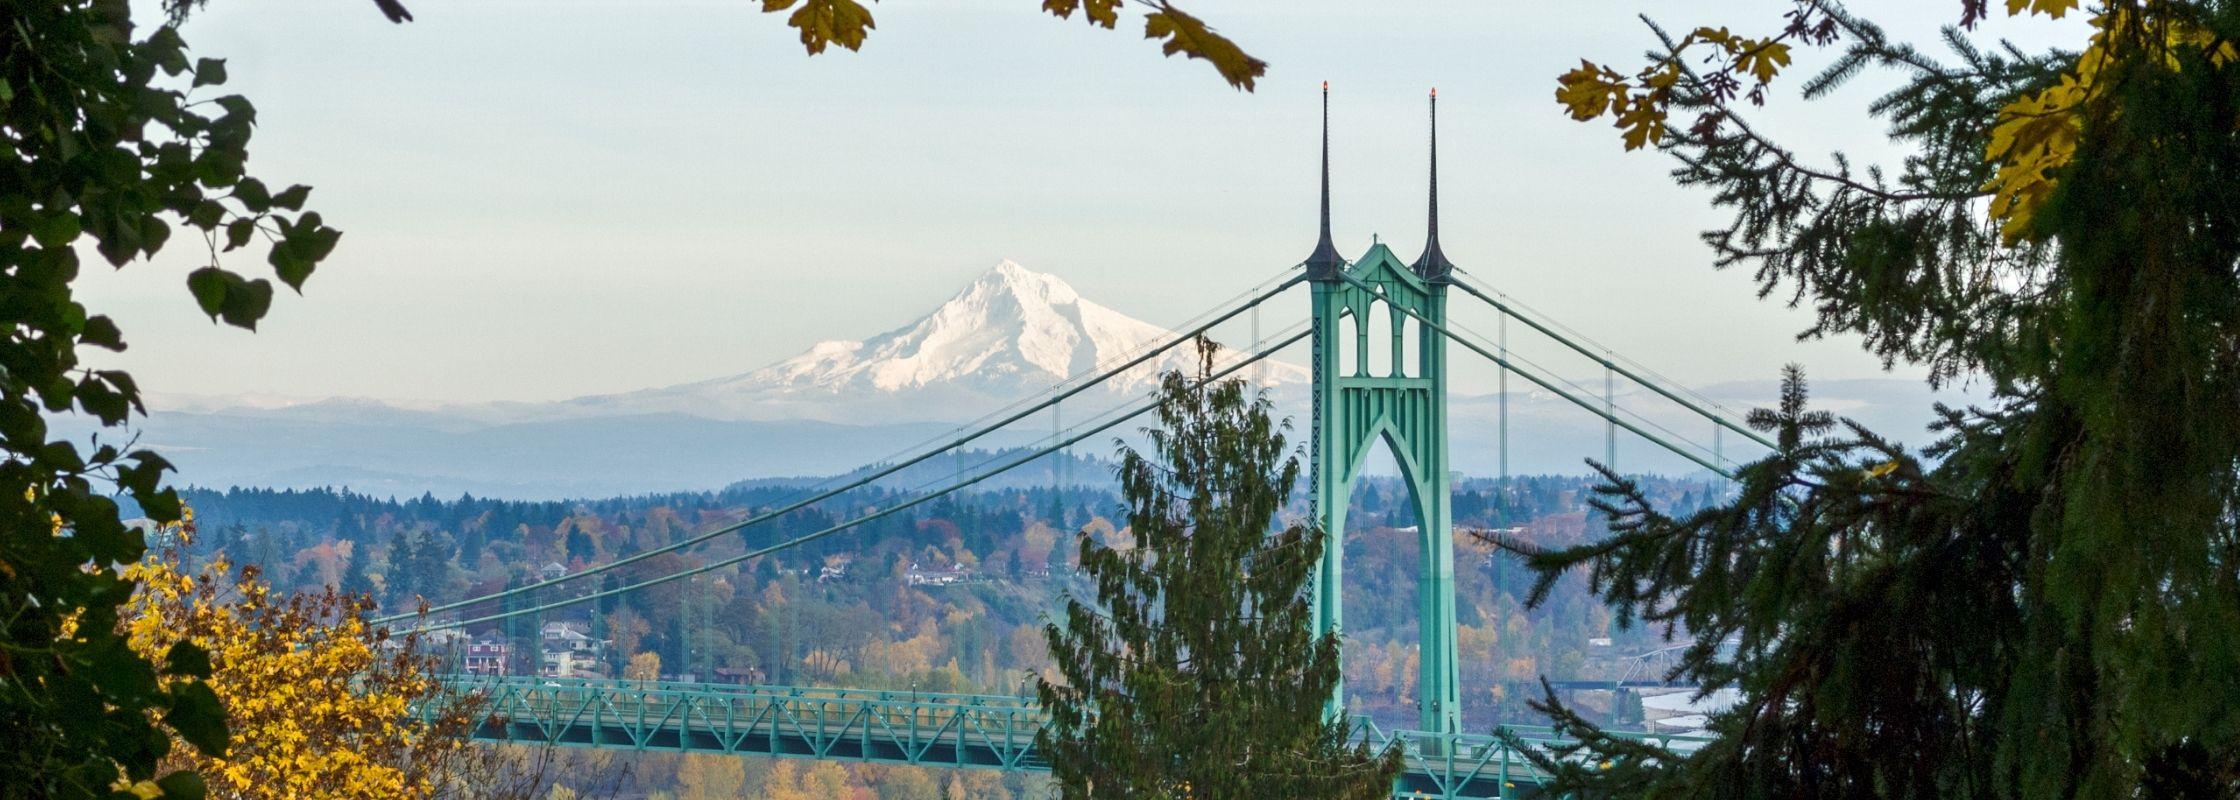 St Johns Bridge in Portland